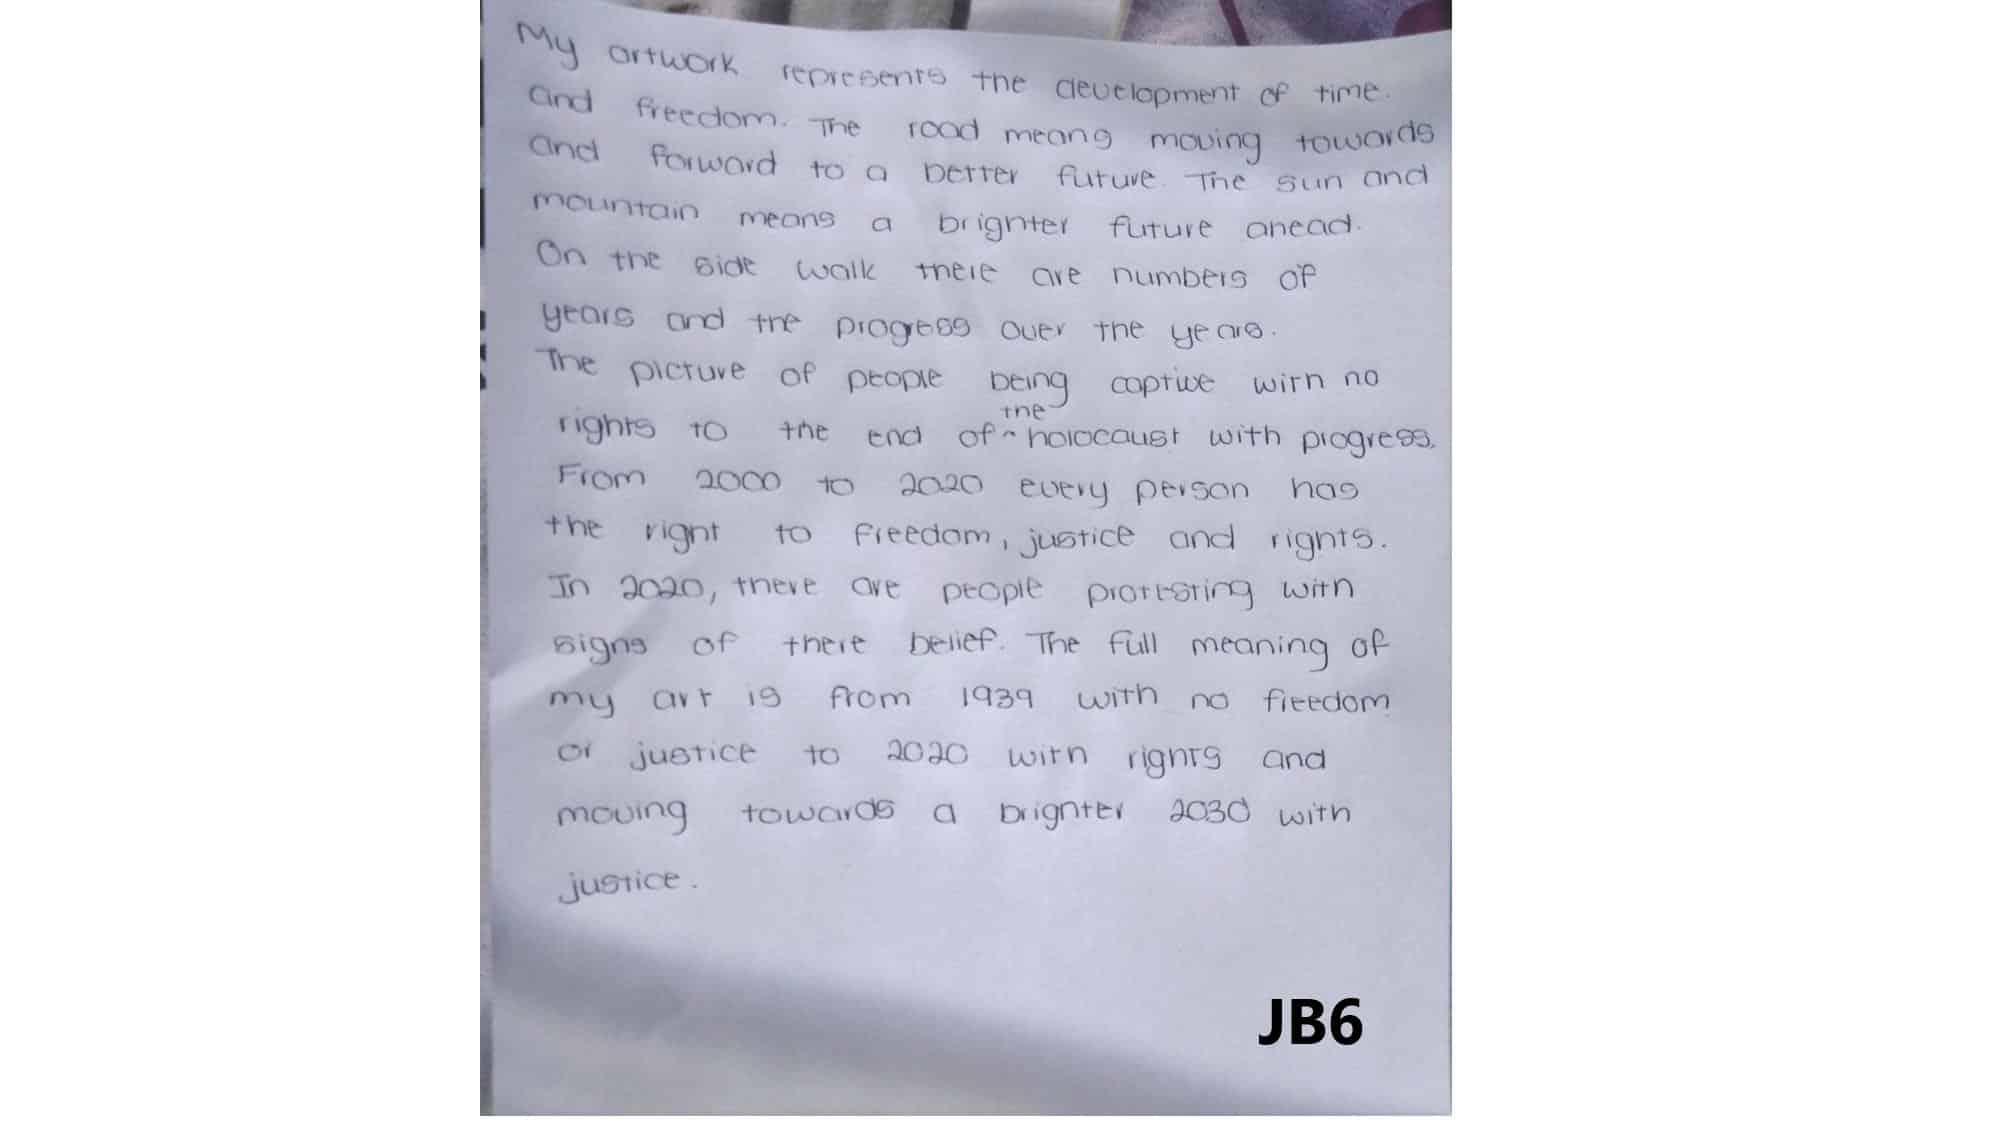 JB6 - brief